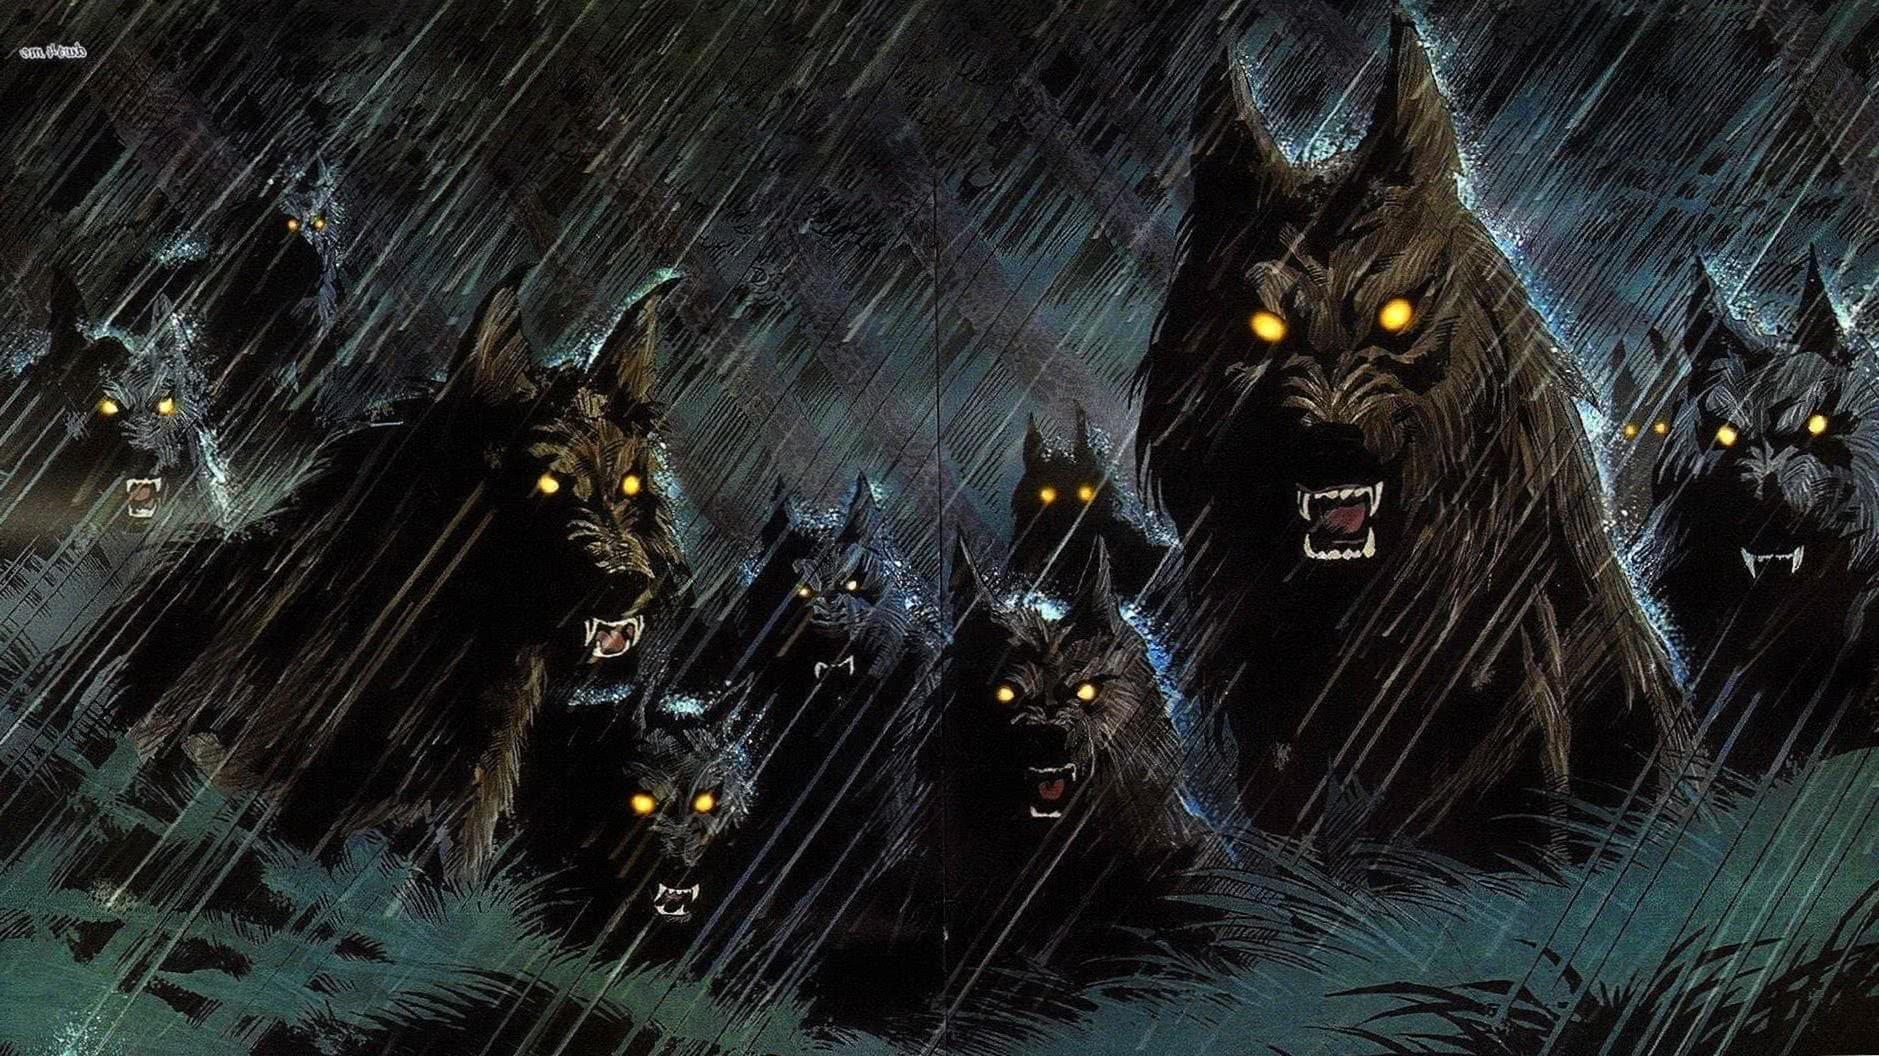 Werewolf HD Mobile Wallpaper